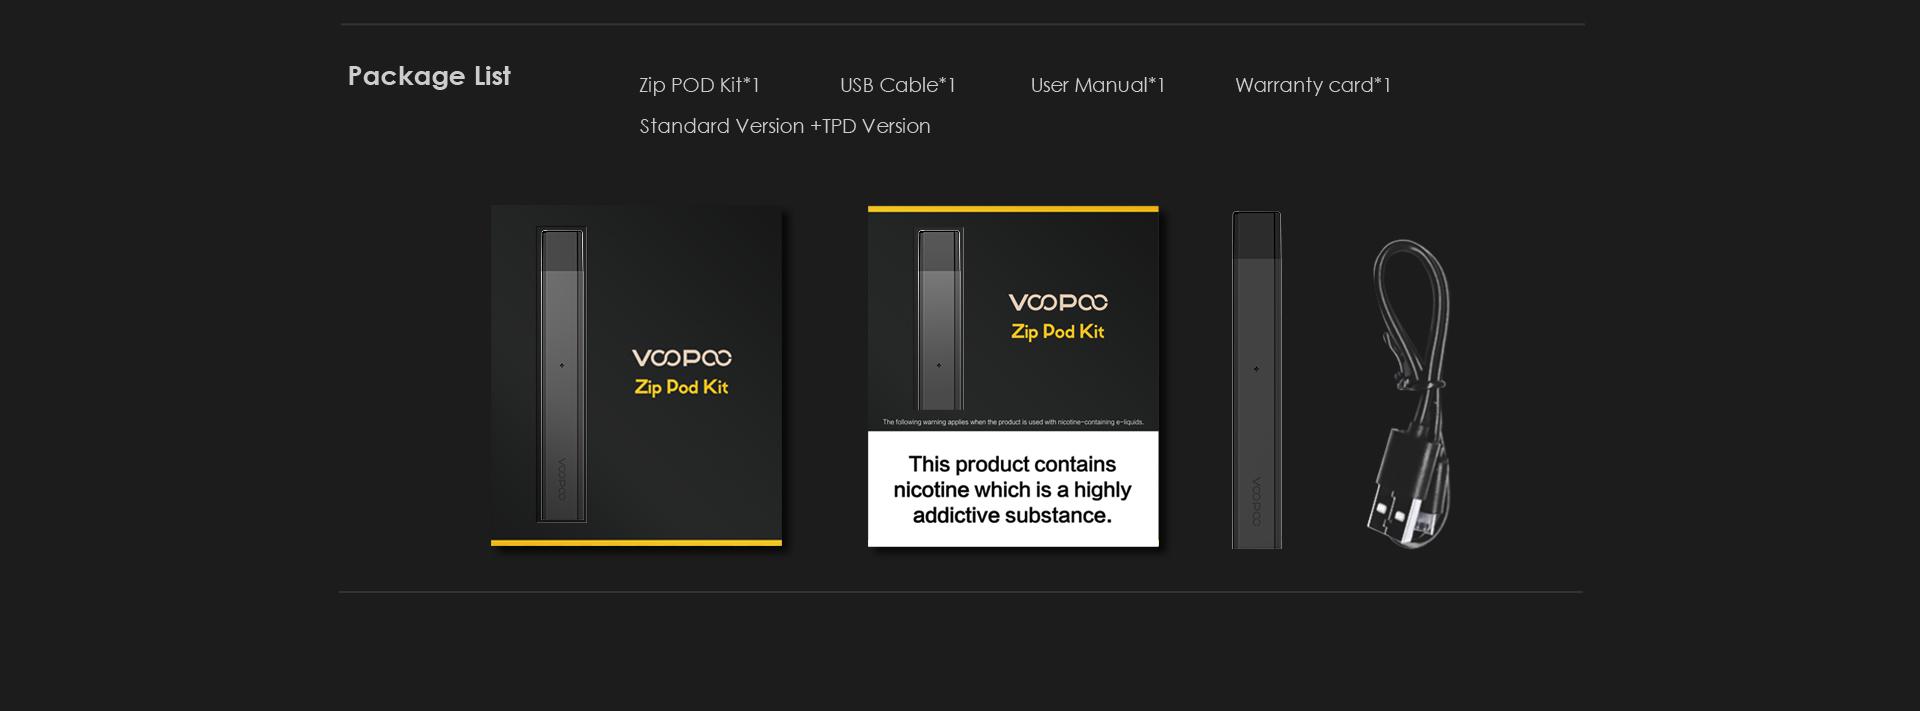 alpha zip pod specifications